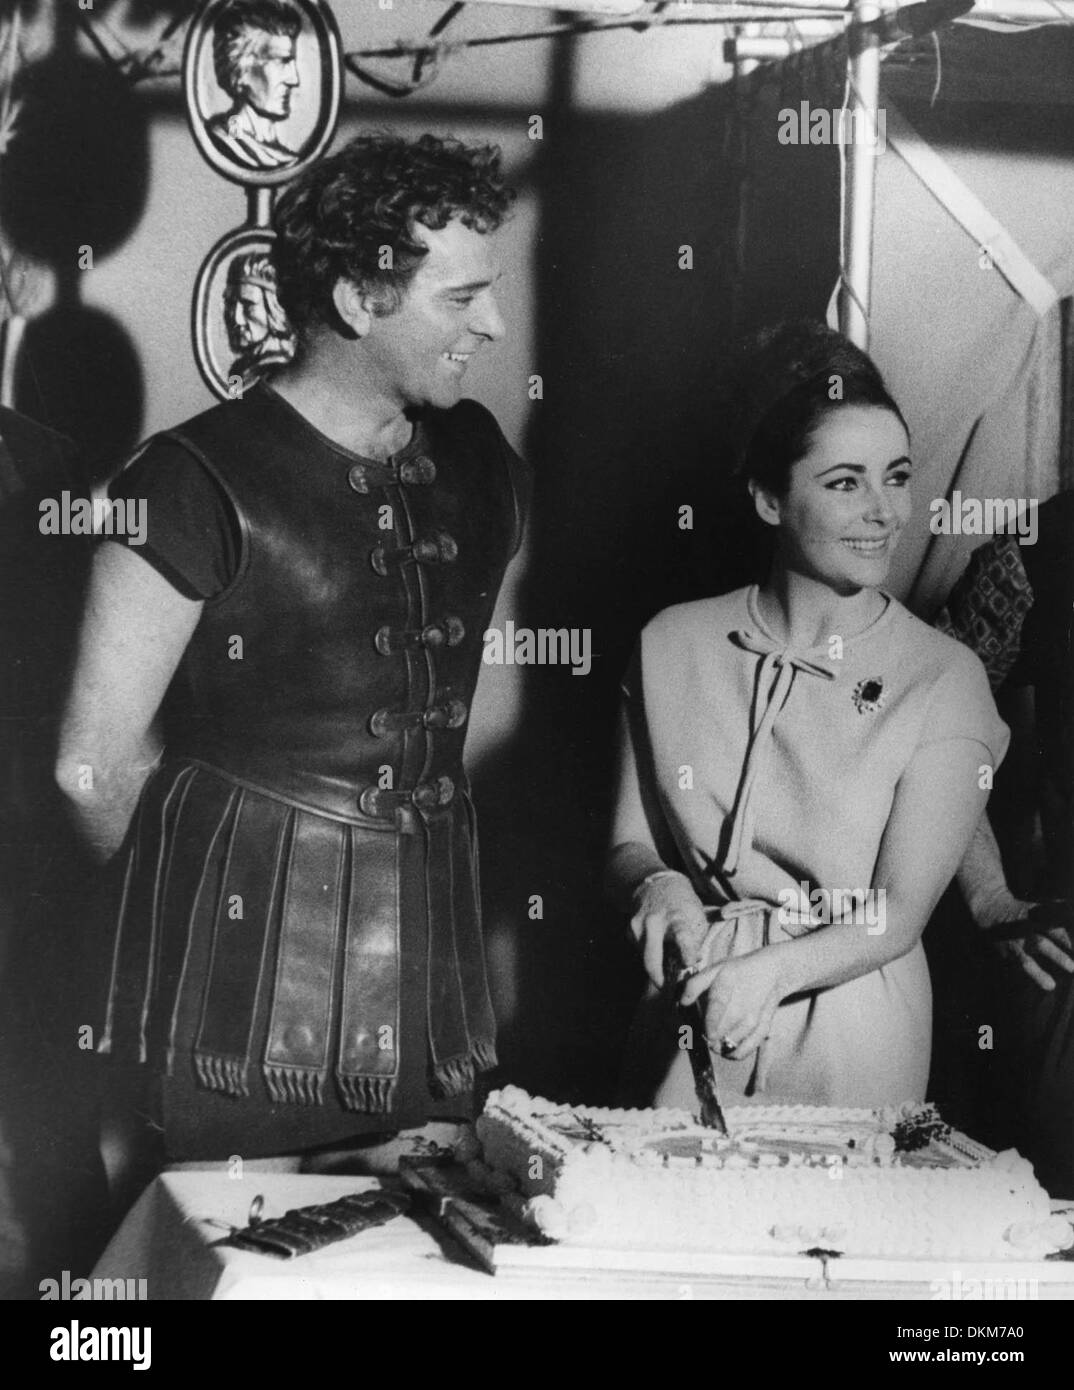 Feb 28 1963 london england u k academy award for Academy award winning movies